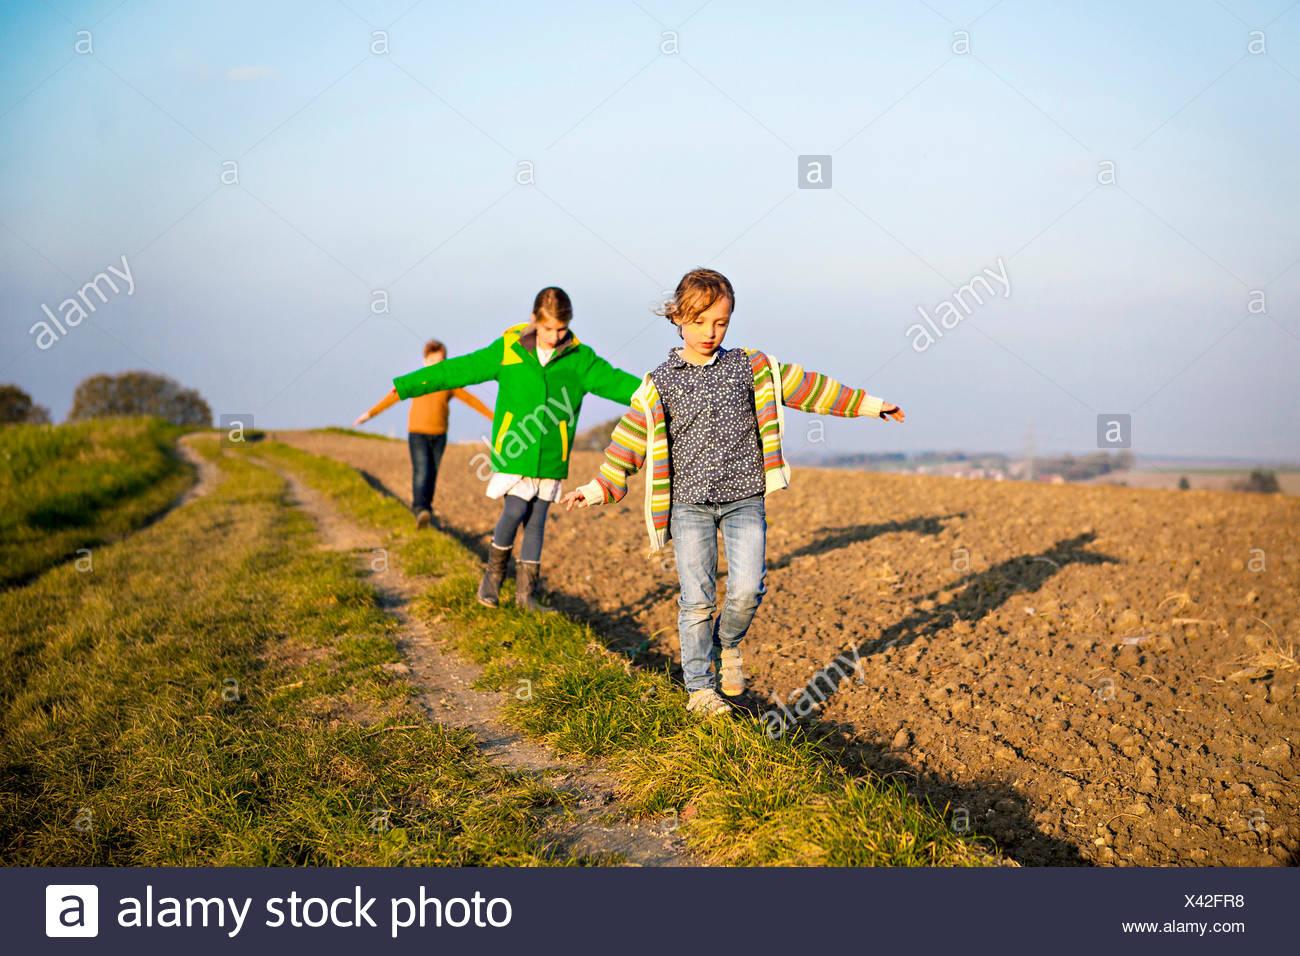 Three children playing outdoors - Stock Image